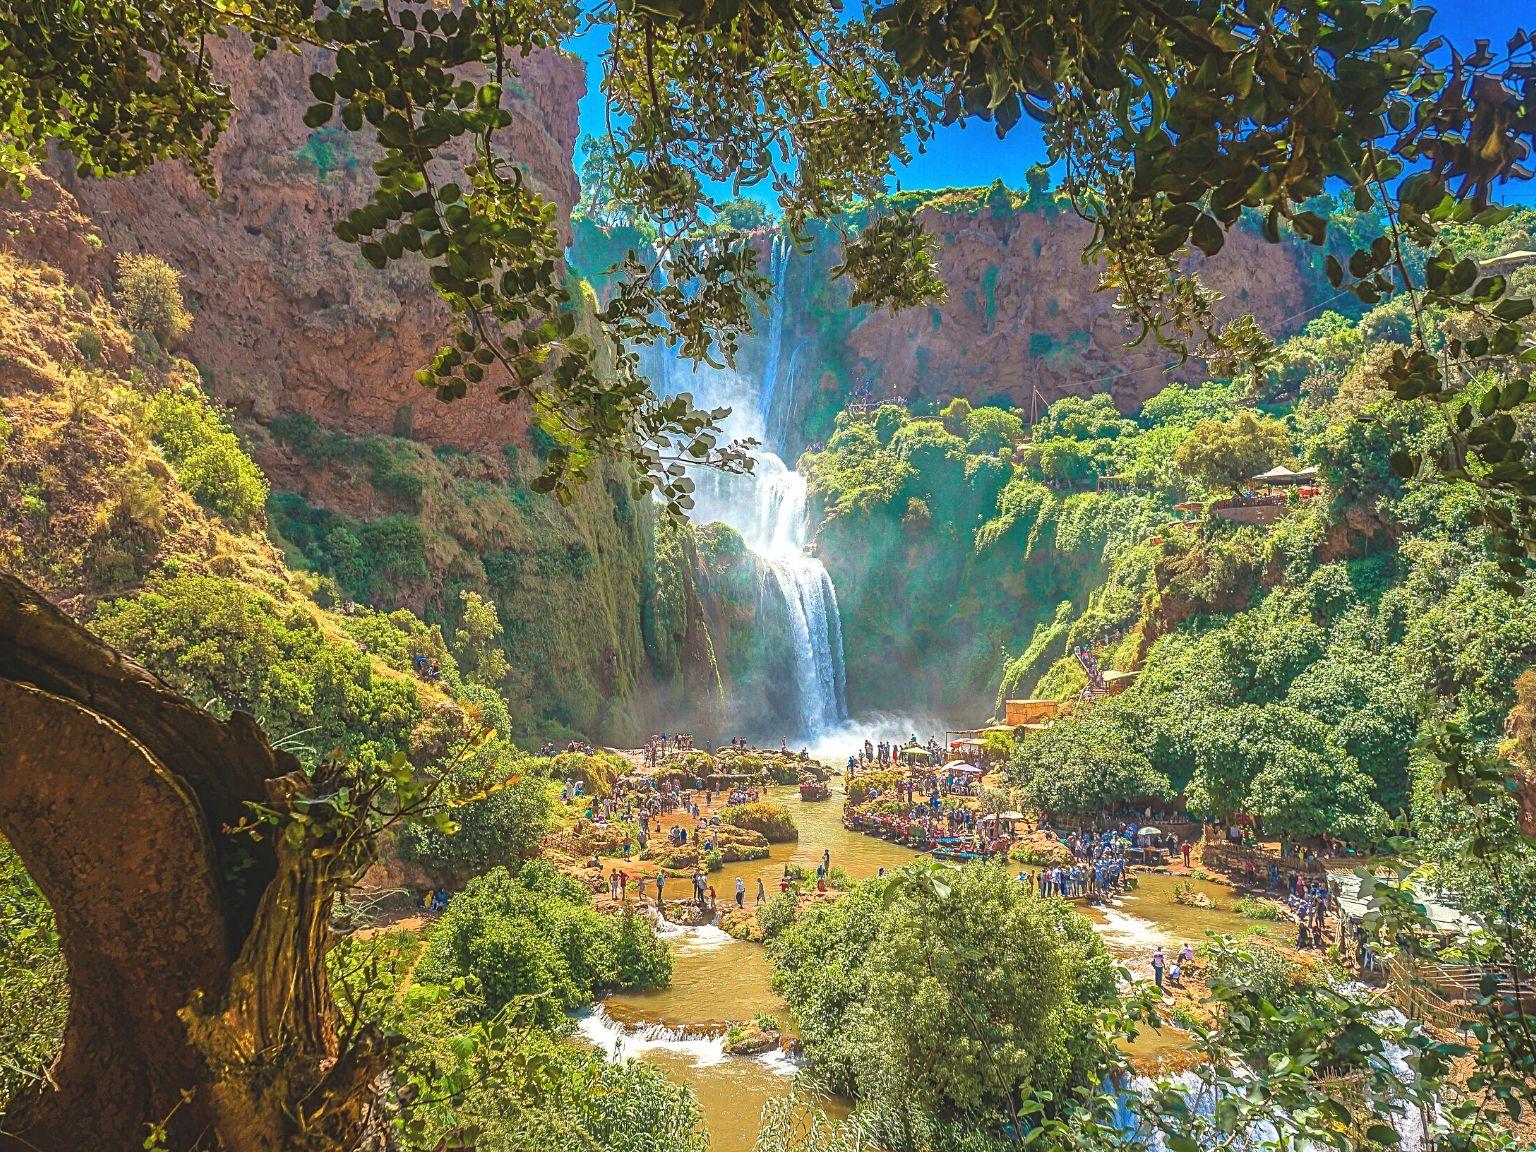 Region de Beni Melal-Jenifra Marruecos